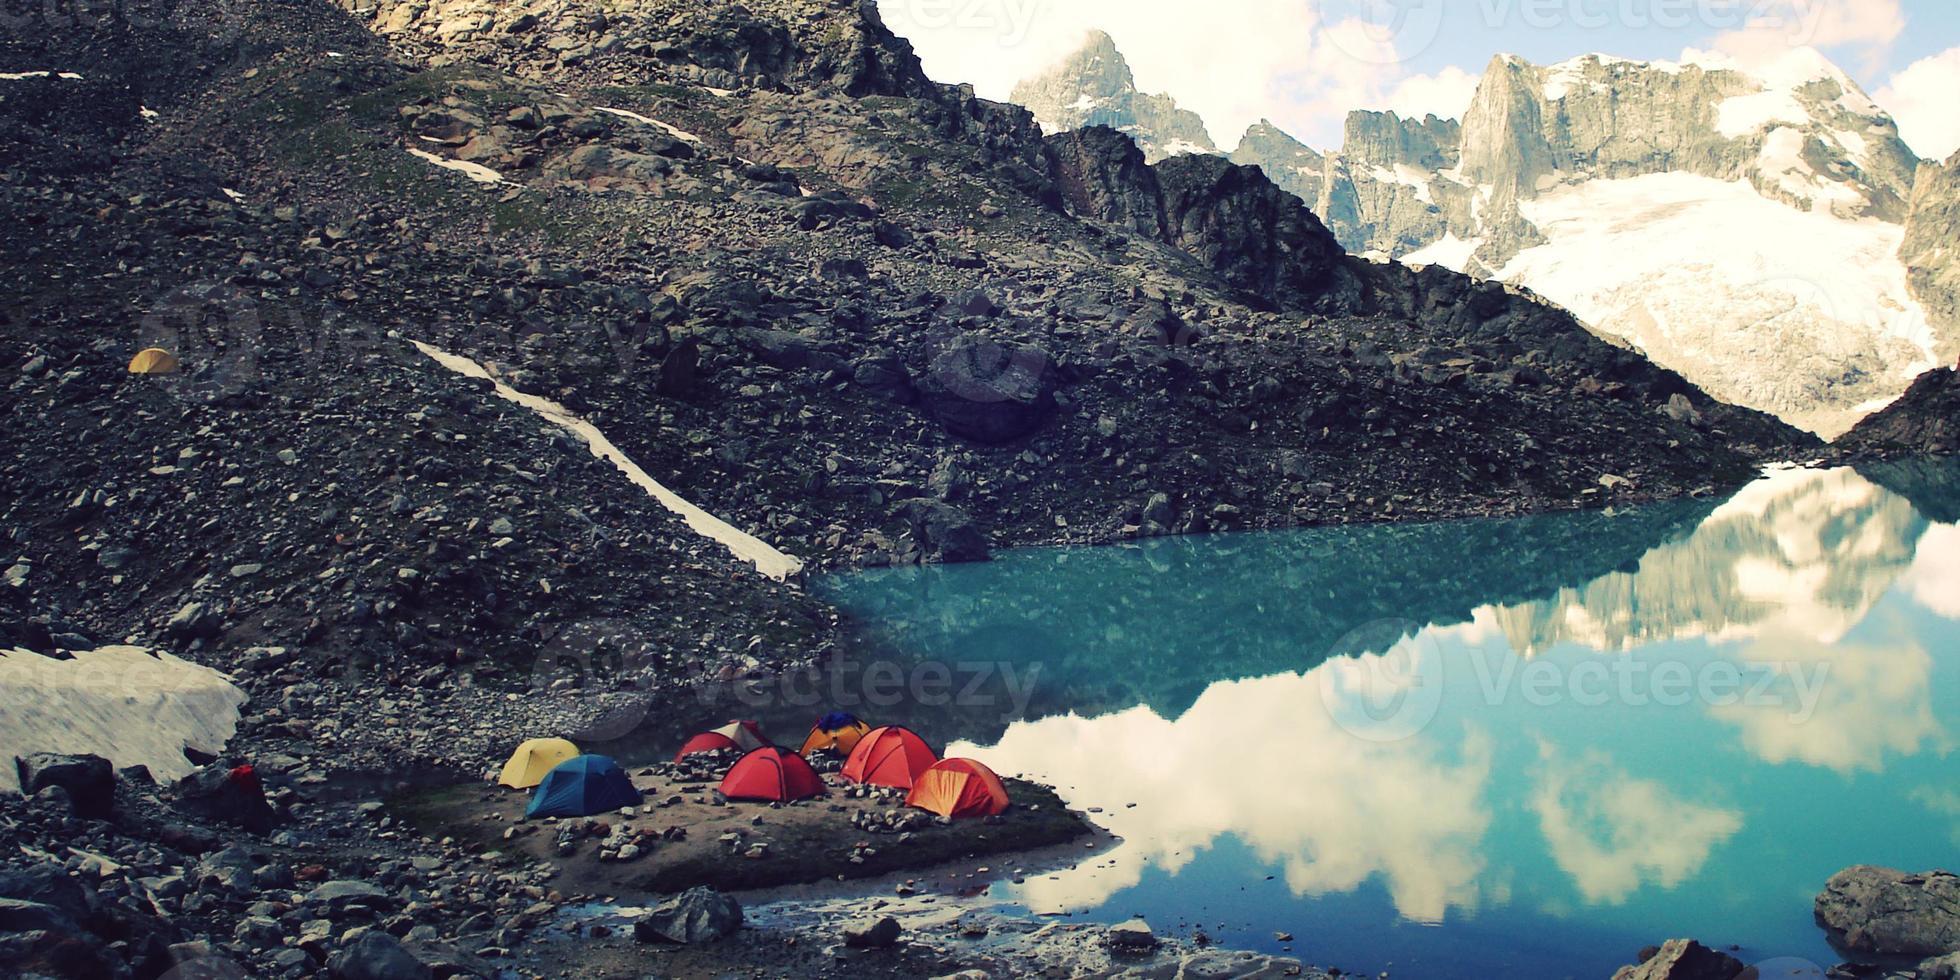 acampamento perto do efeito vintage lago alpino. barracas coloridas. montanhas do Cáucaso. foto